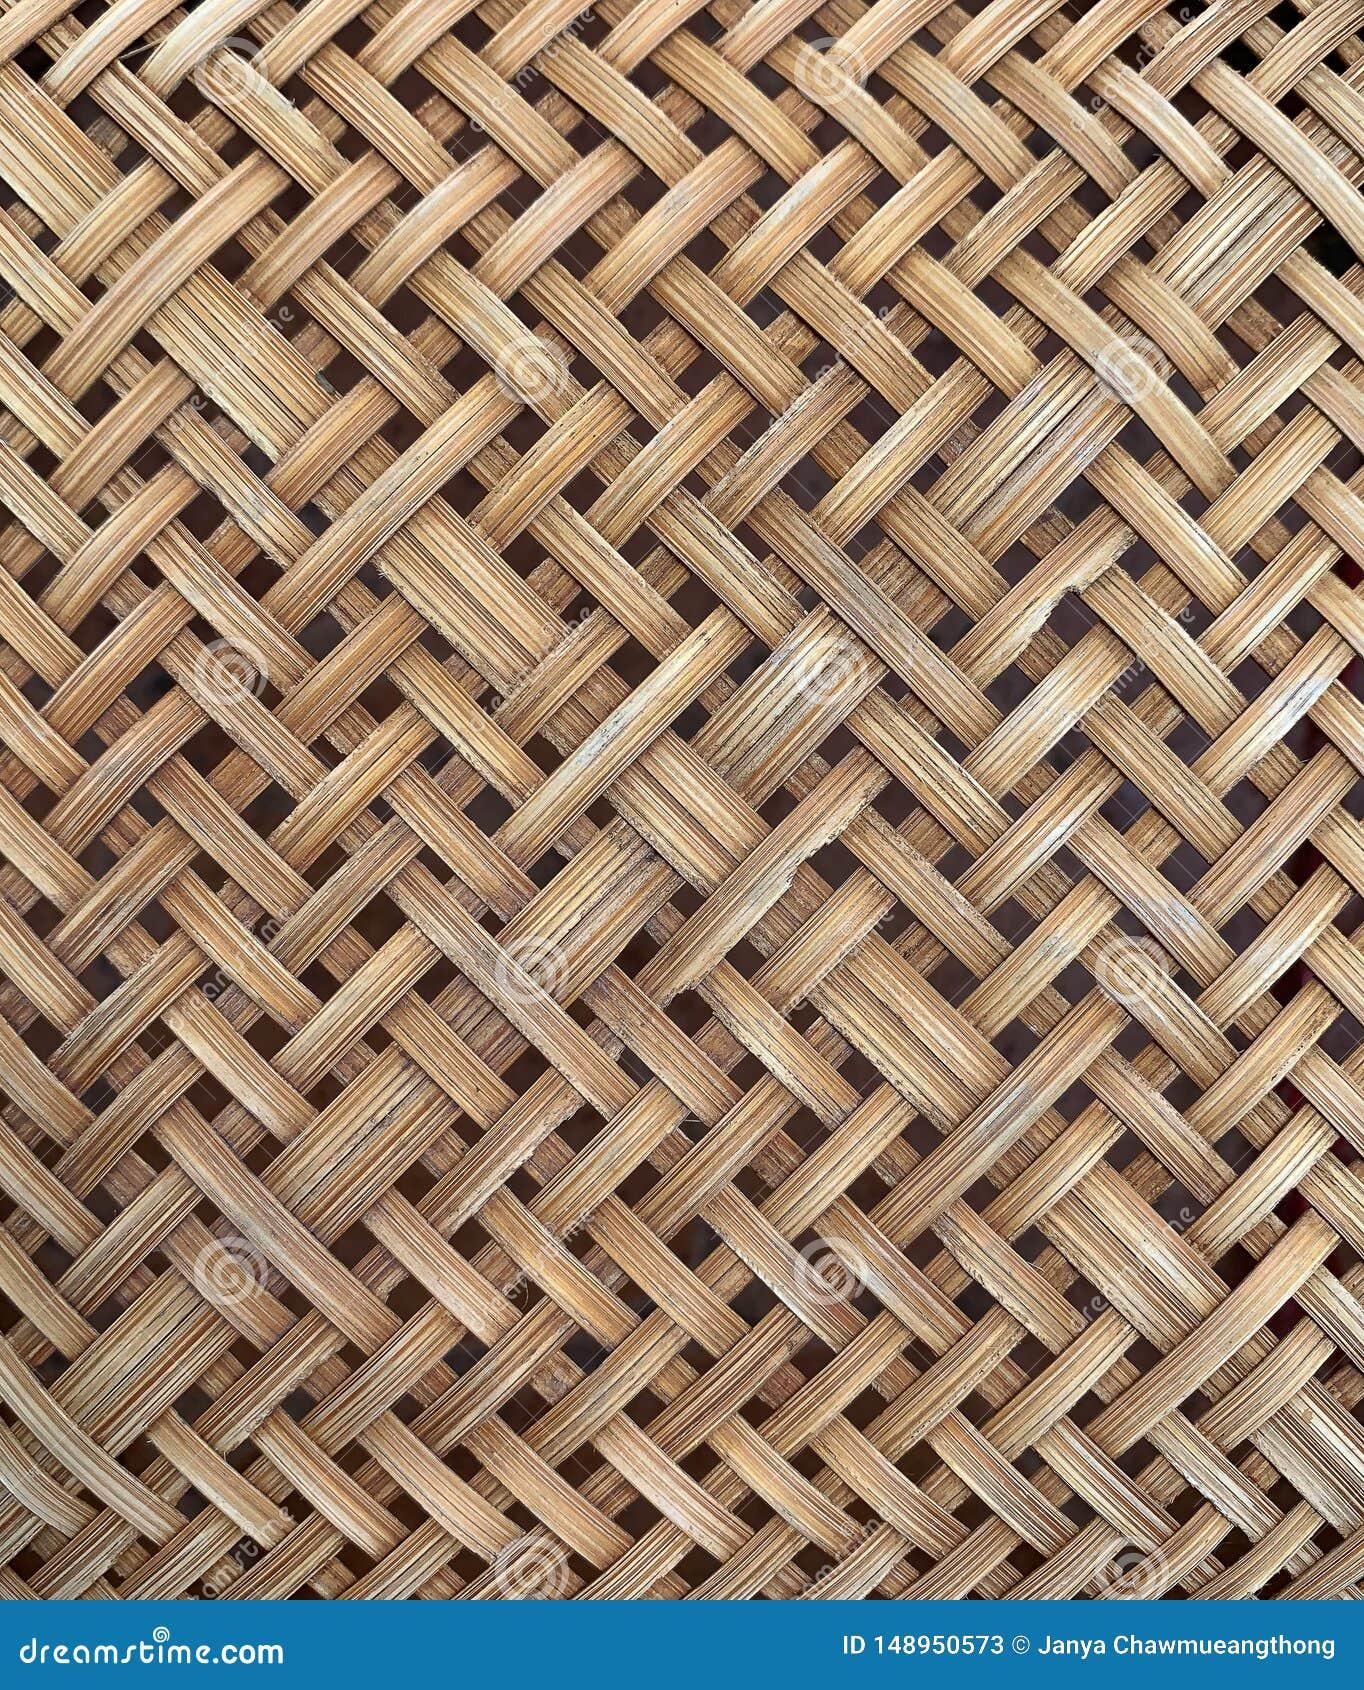 Escorredor de bambu